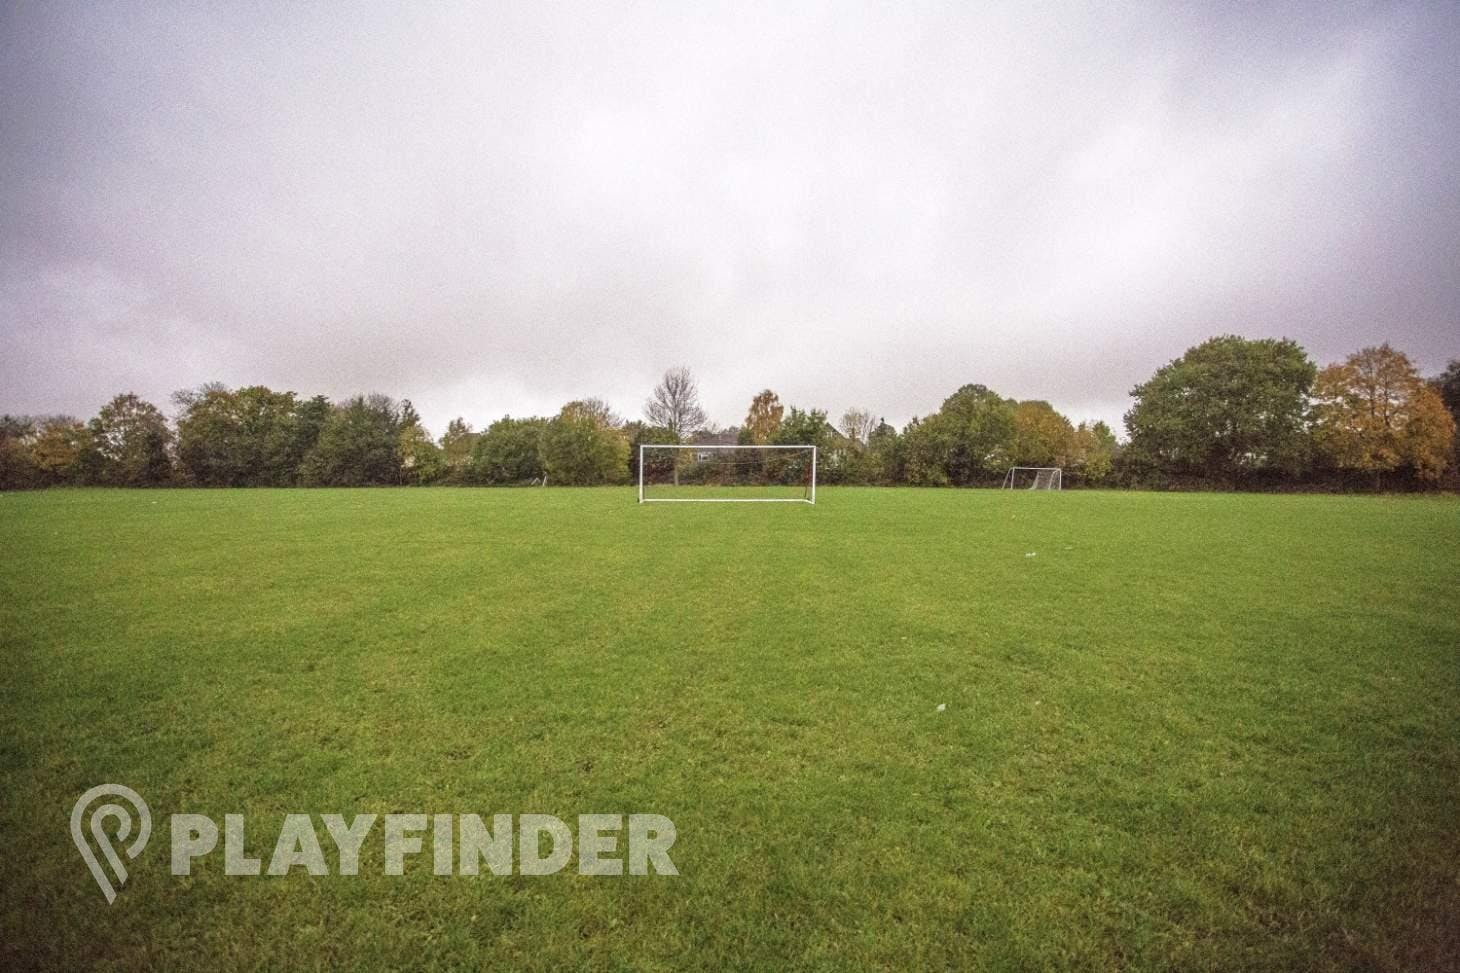 Harris Academy Beckenham Union | Grass rugby pitch